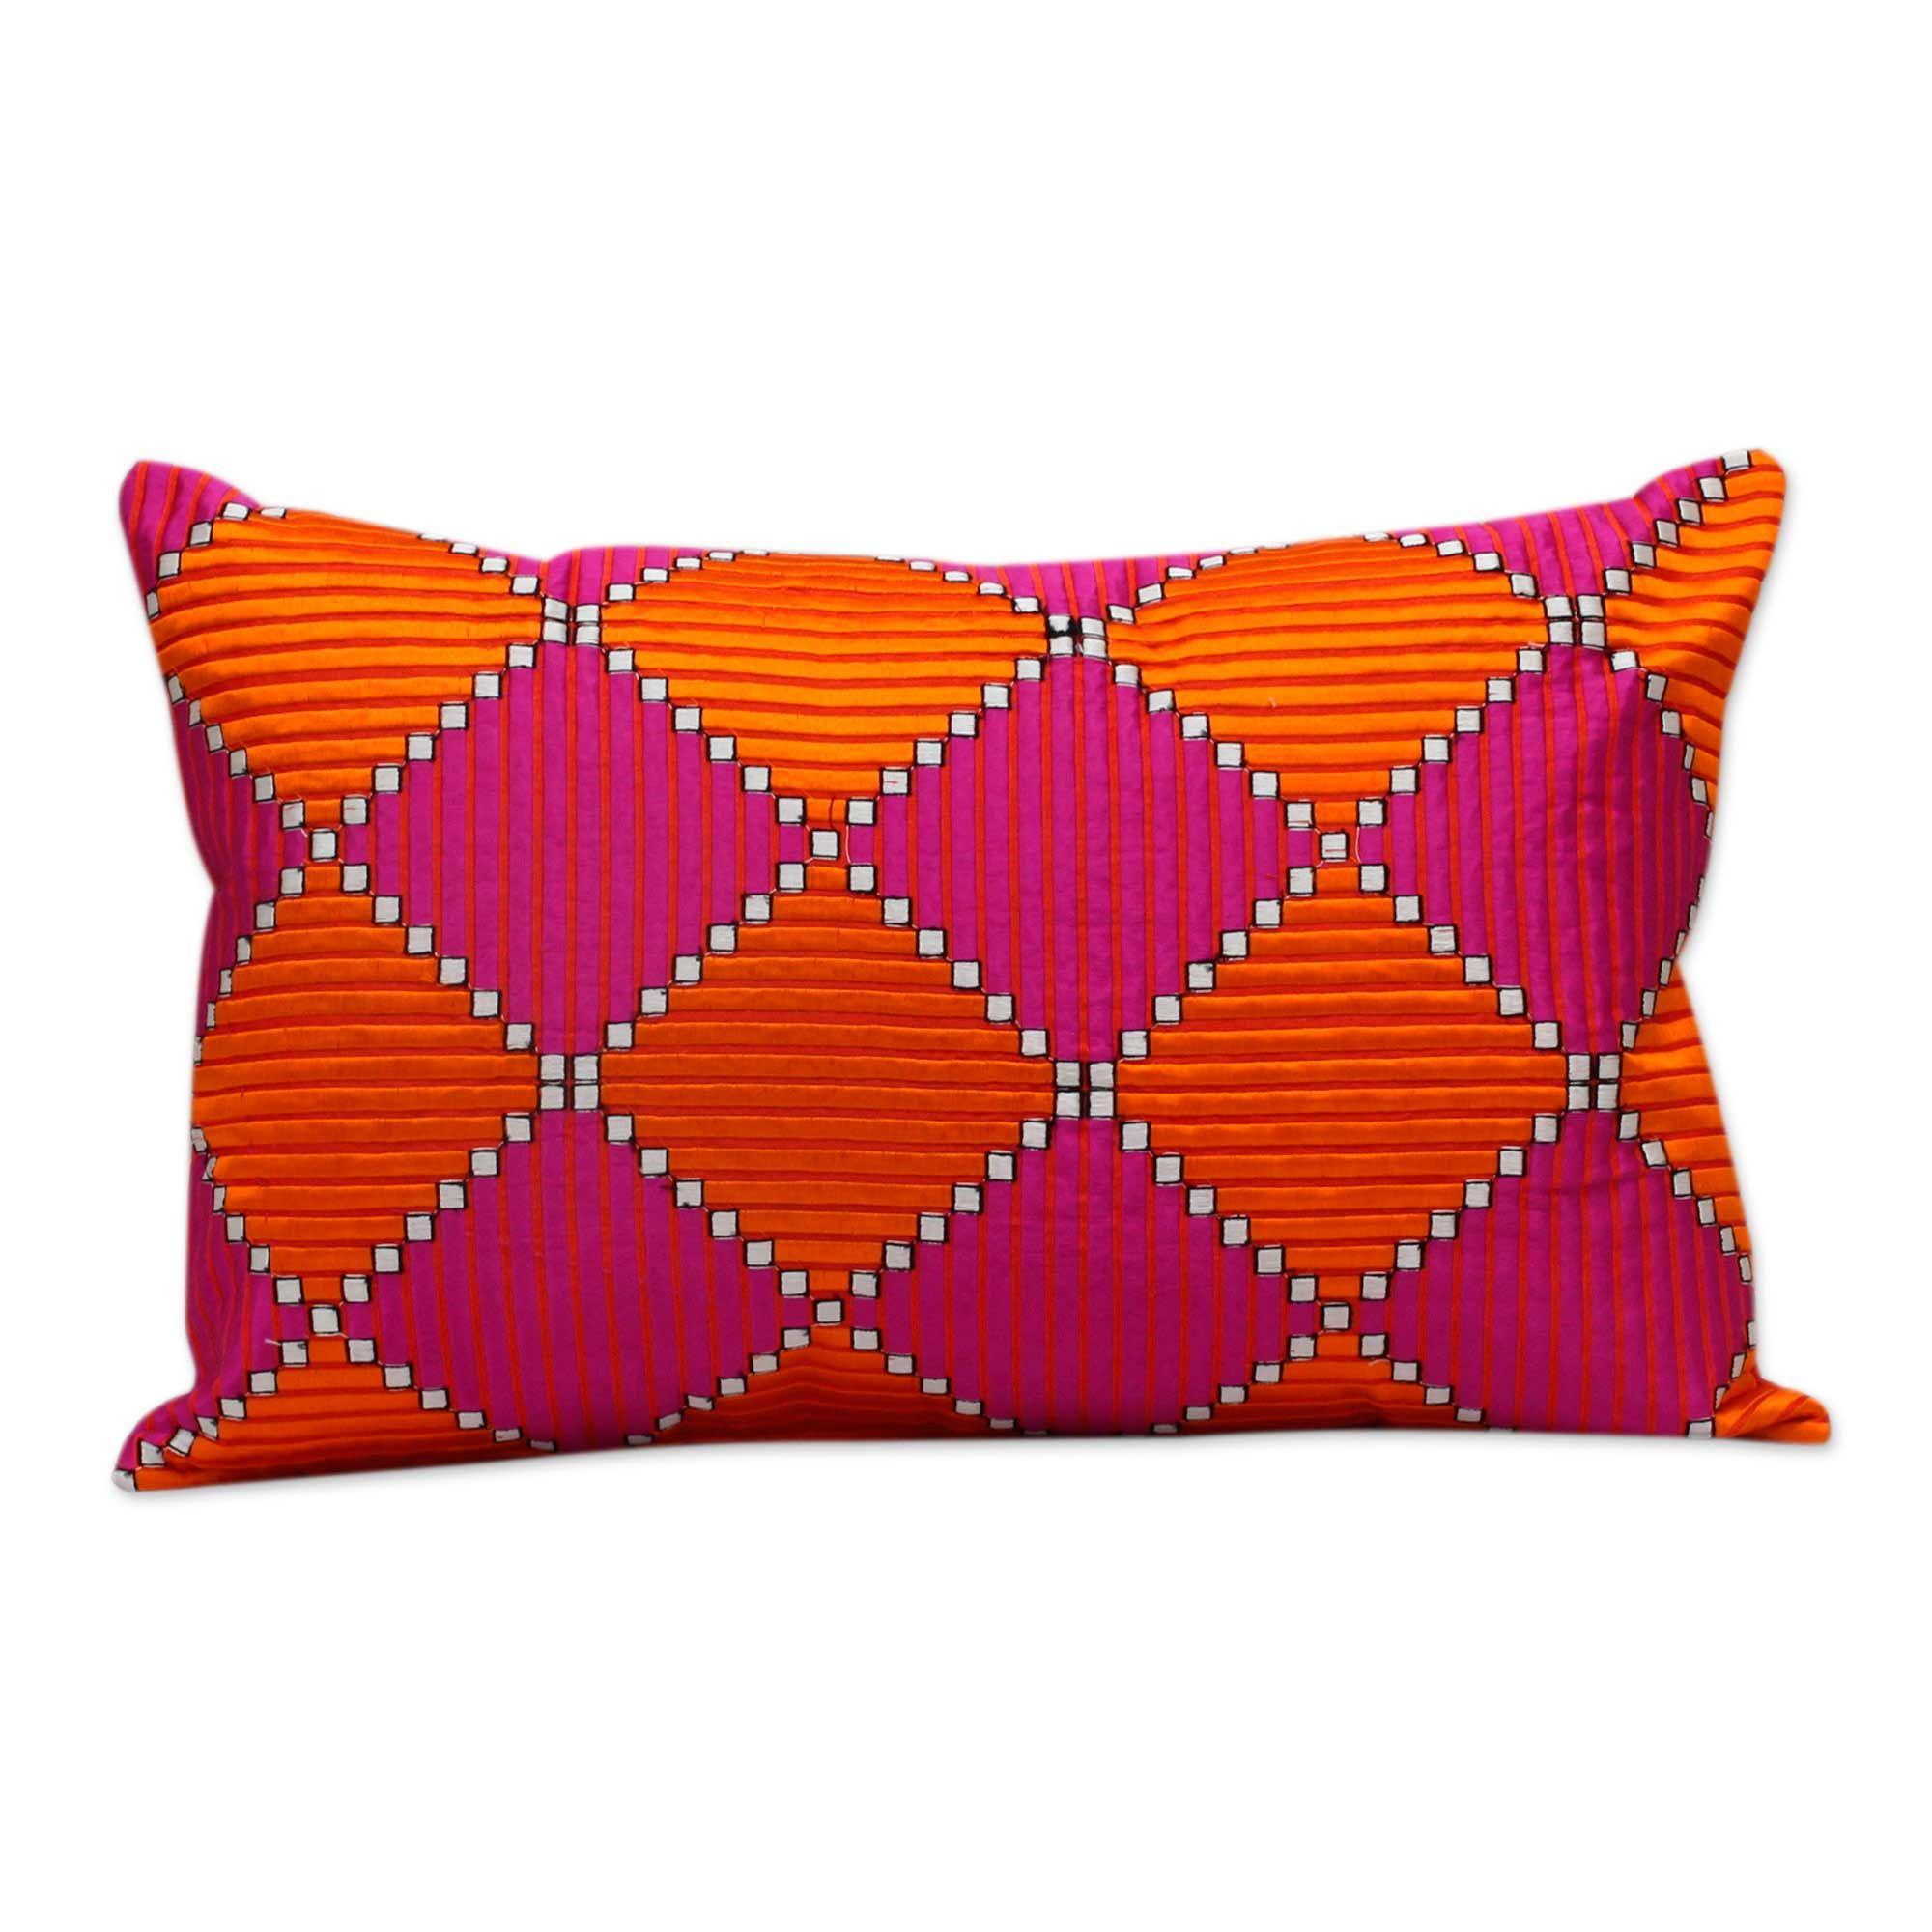 Machine Embroidered Satin Stitch Geometric Cushion Cover Gardens